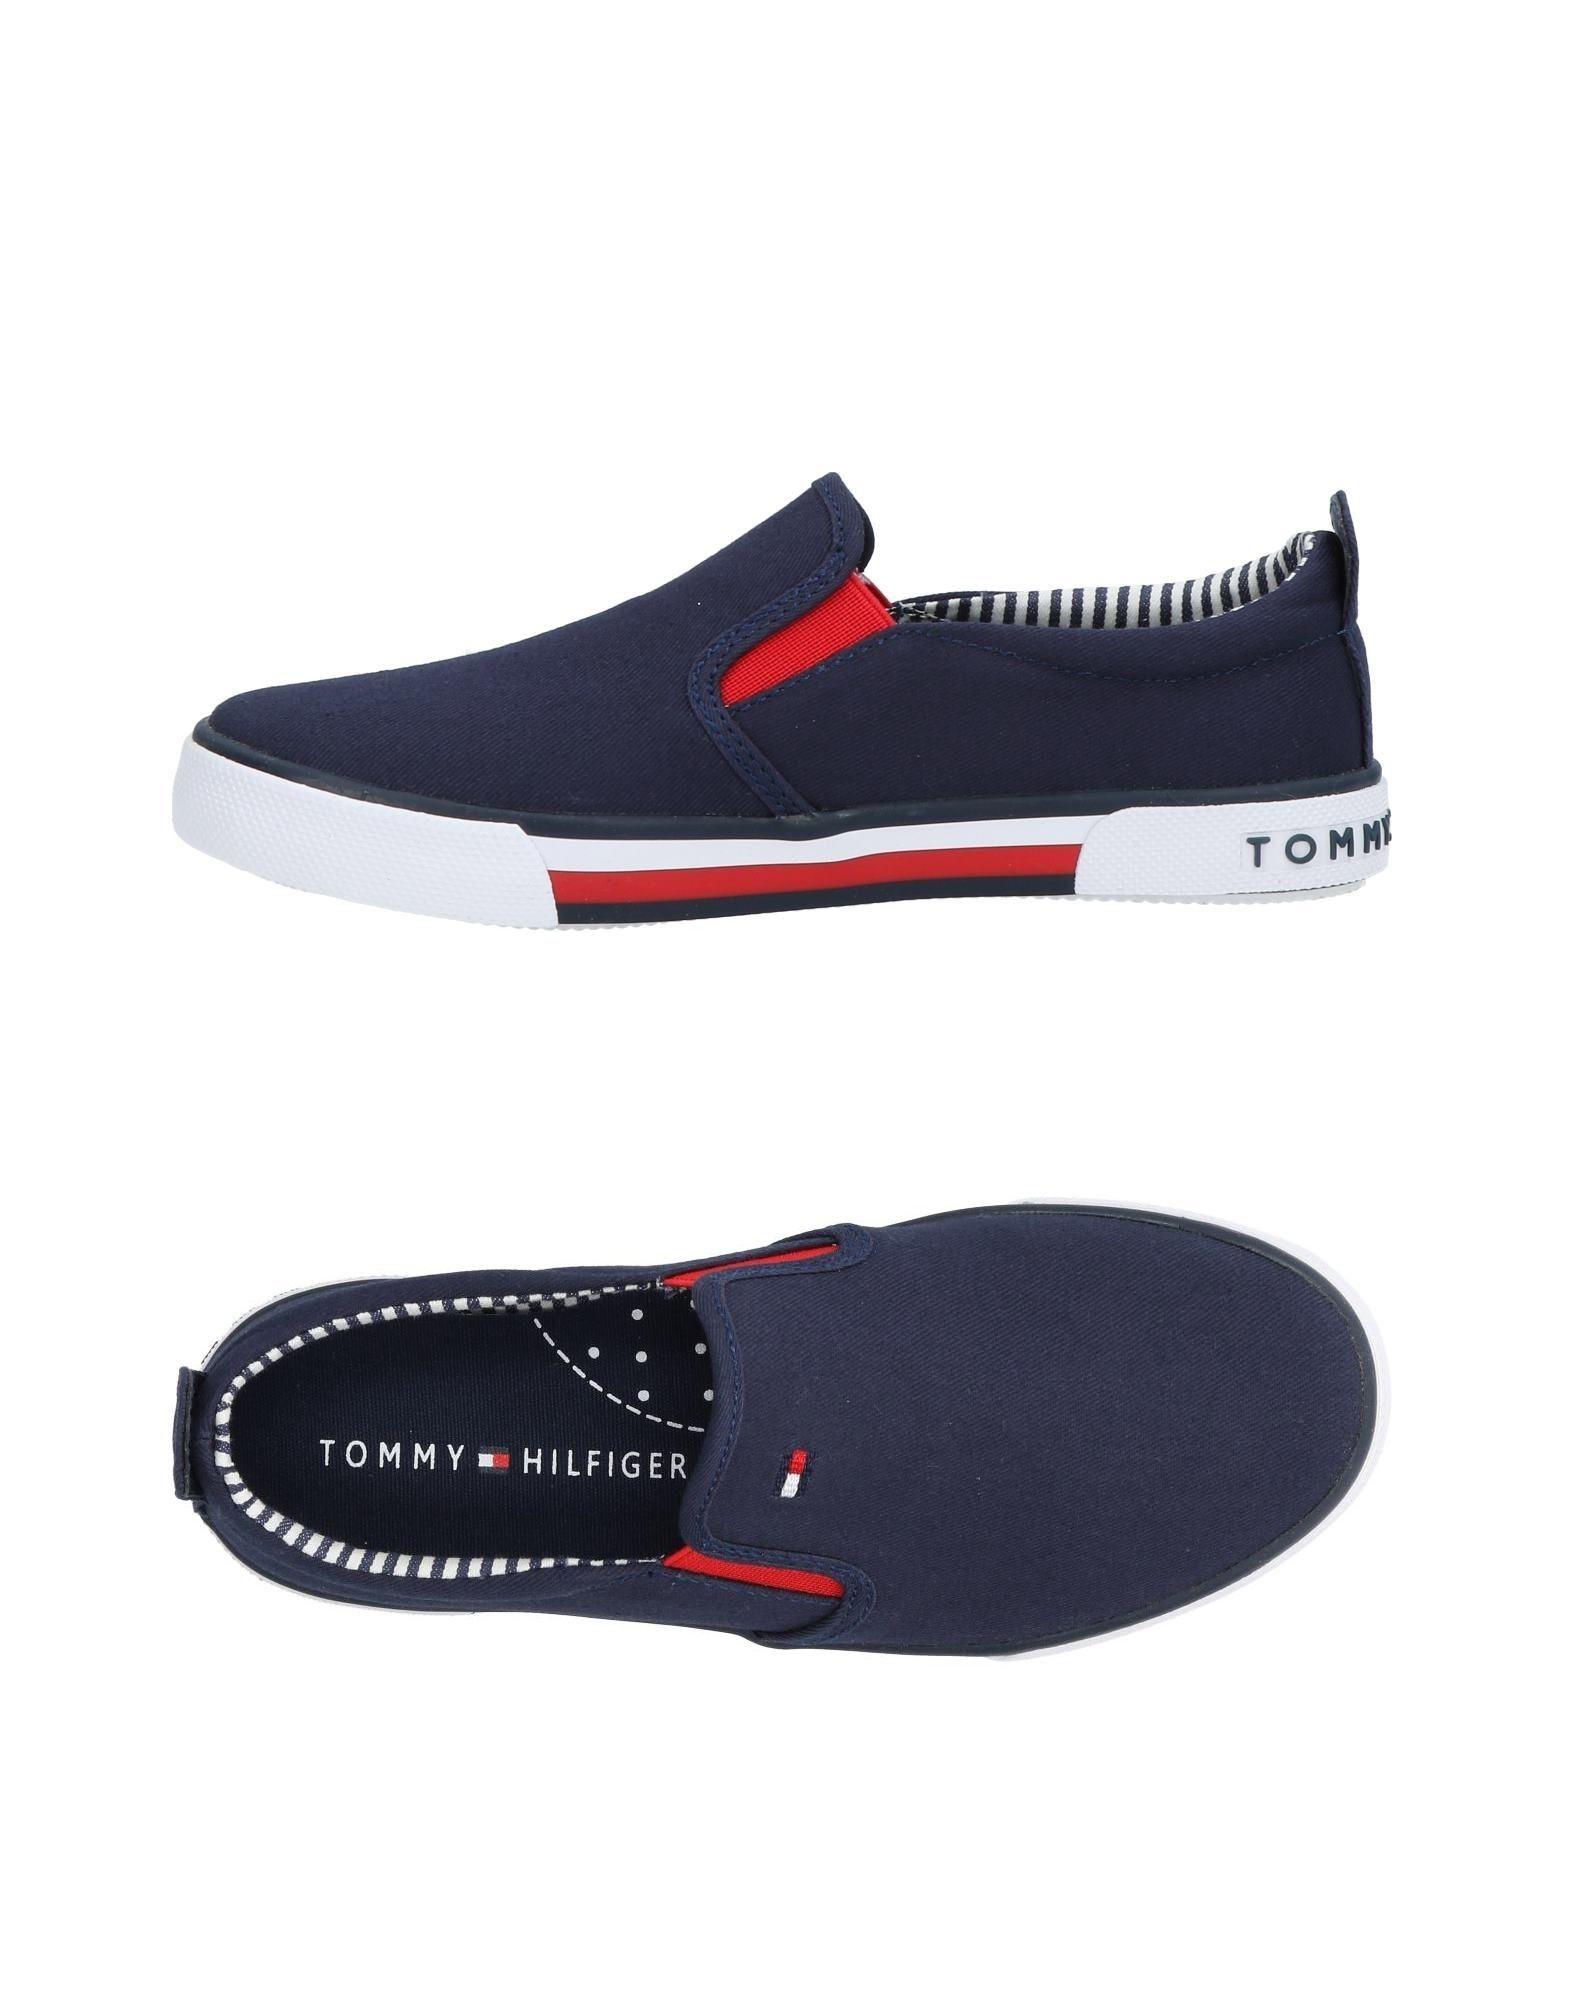 buy online cb9cb 4f31f TOMMY HILFIGER Sneakers - Footwear   YOOX.COM